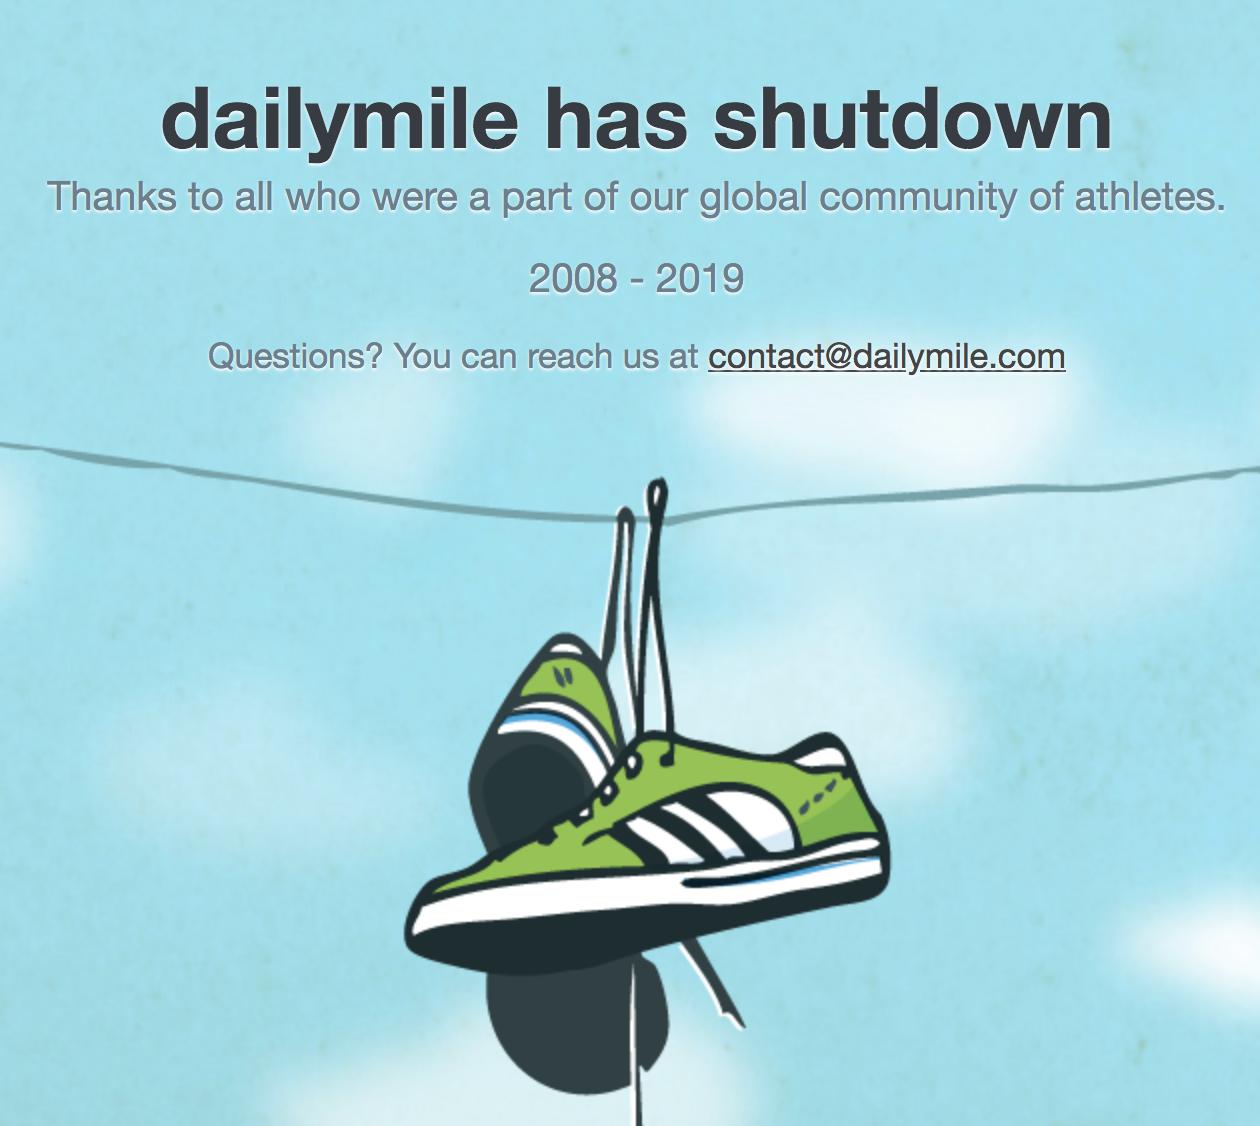 dailymile shutdown screenshot